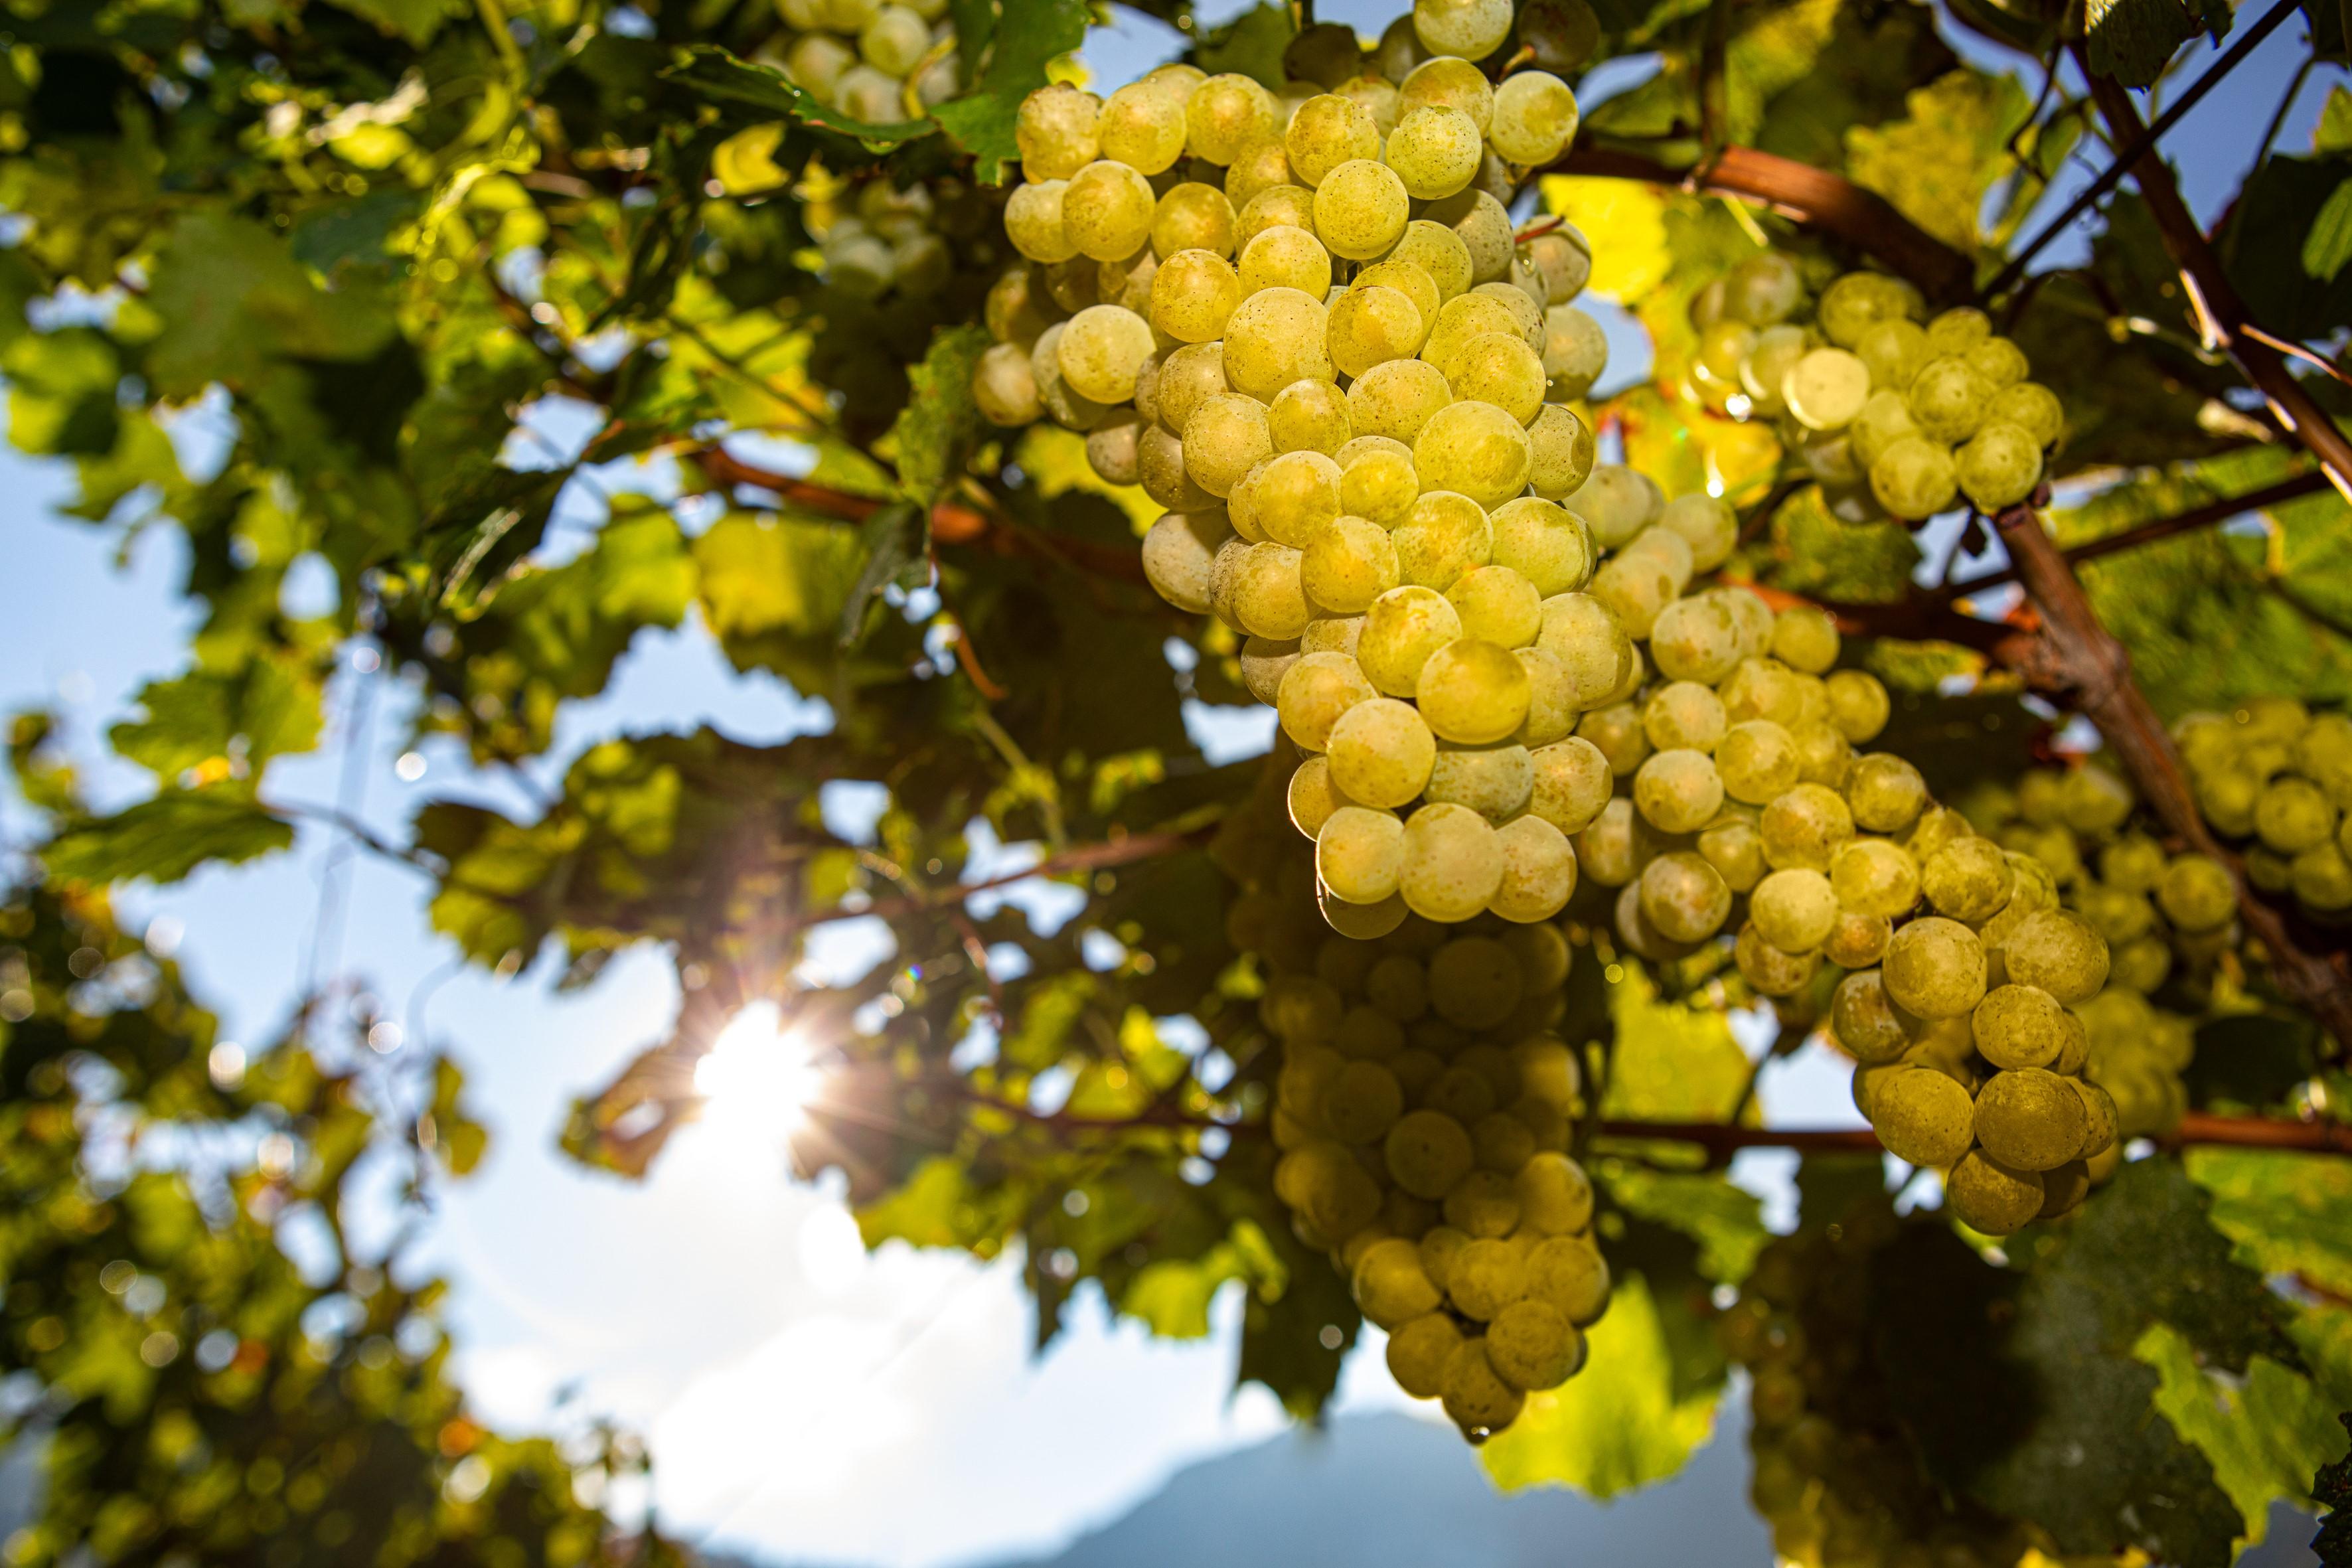 Tenuta Margon begins its 2020 harvest